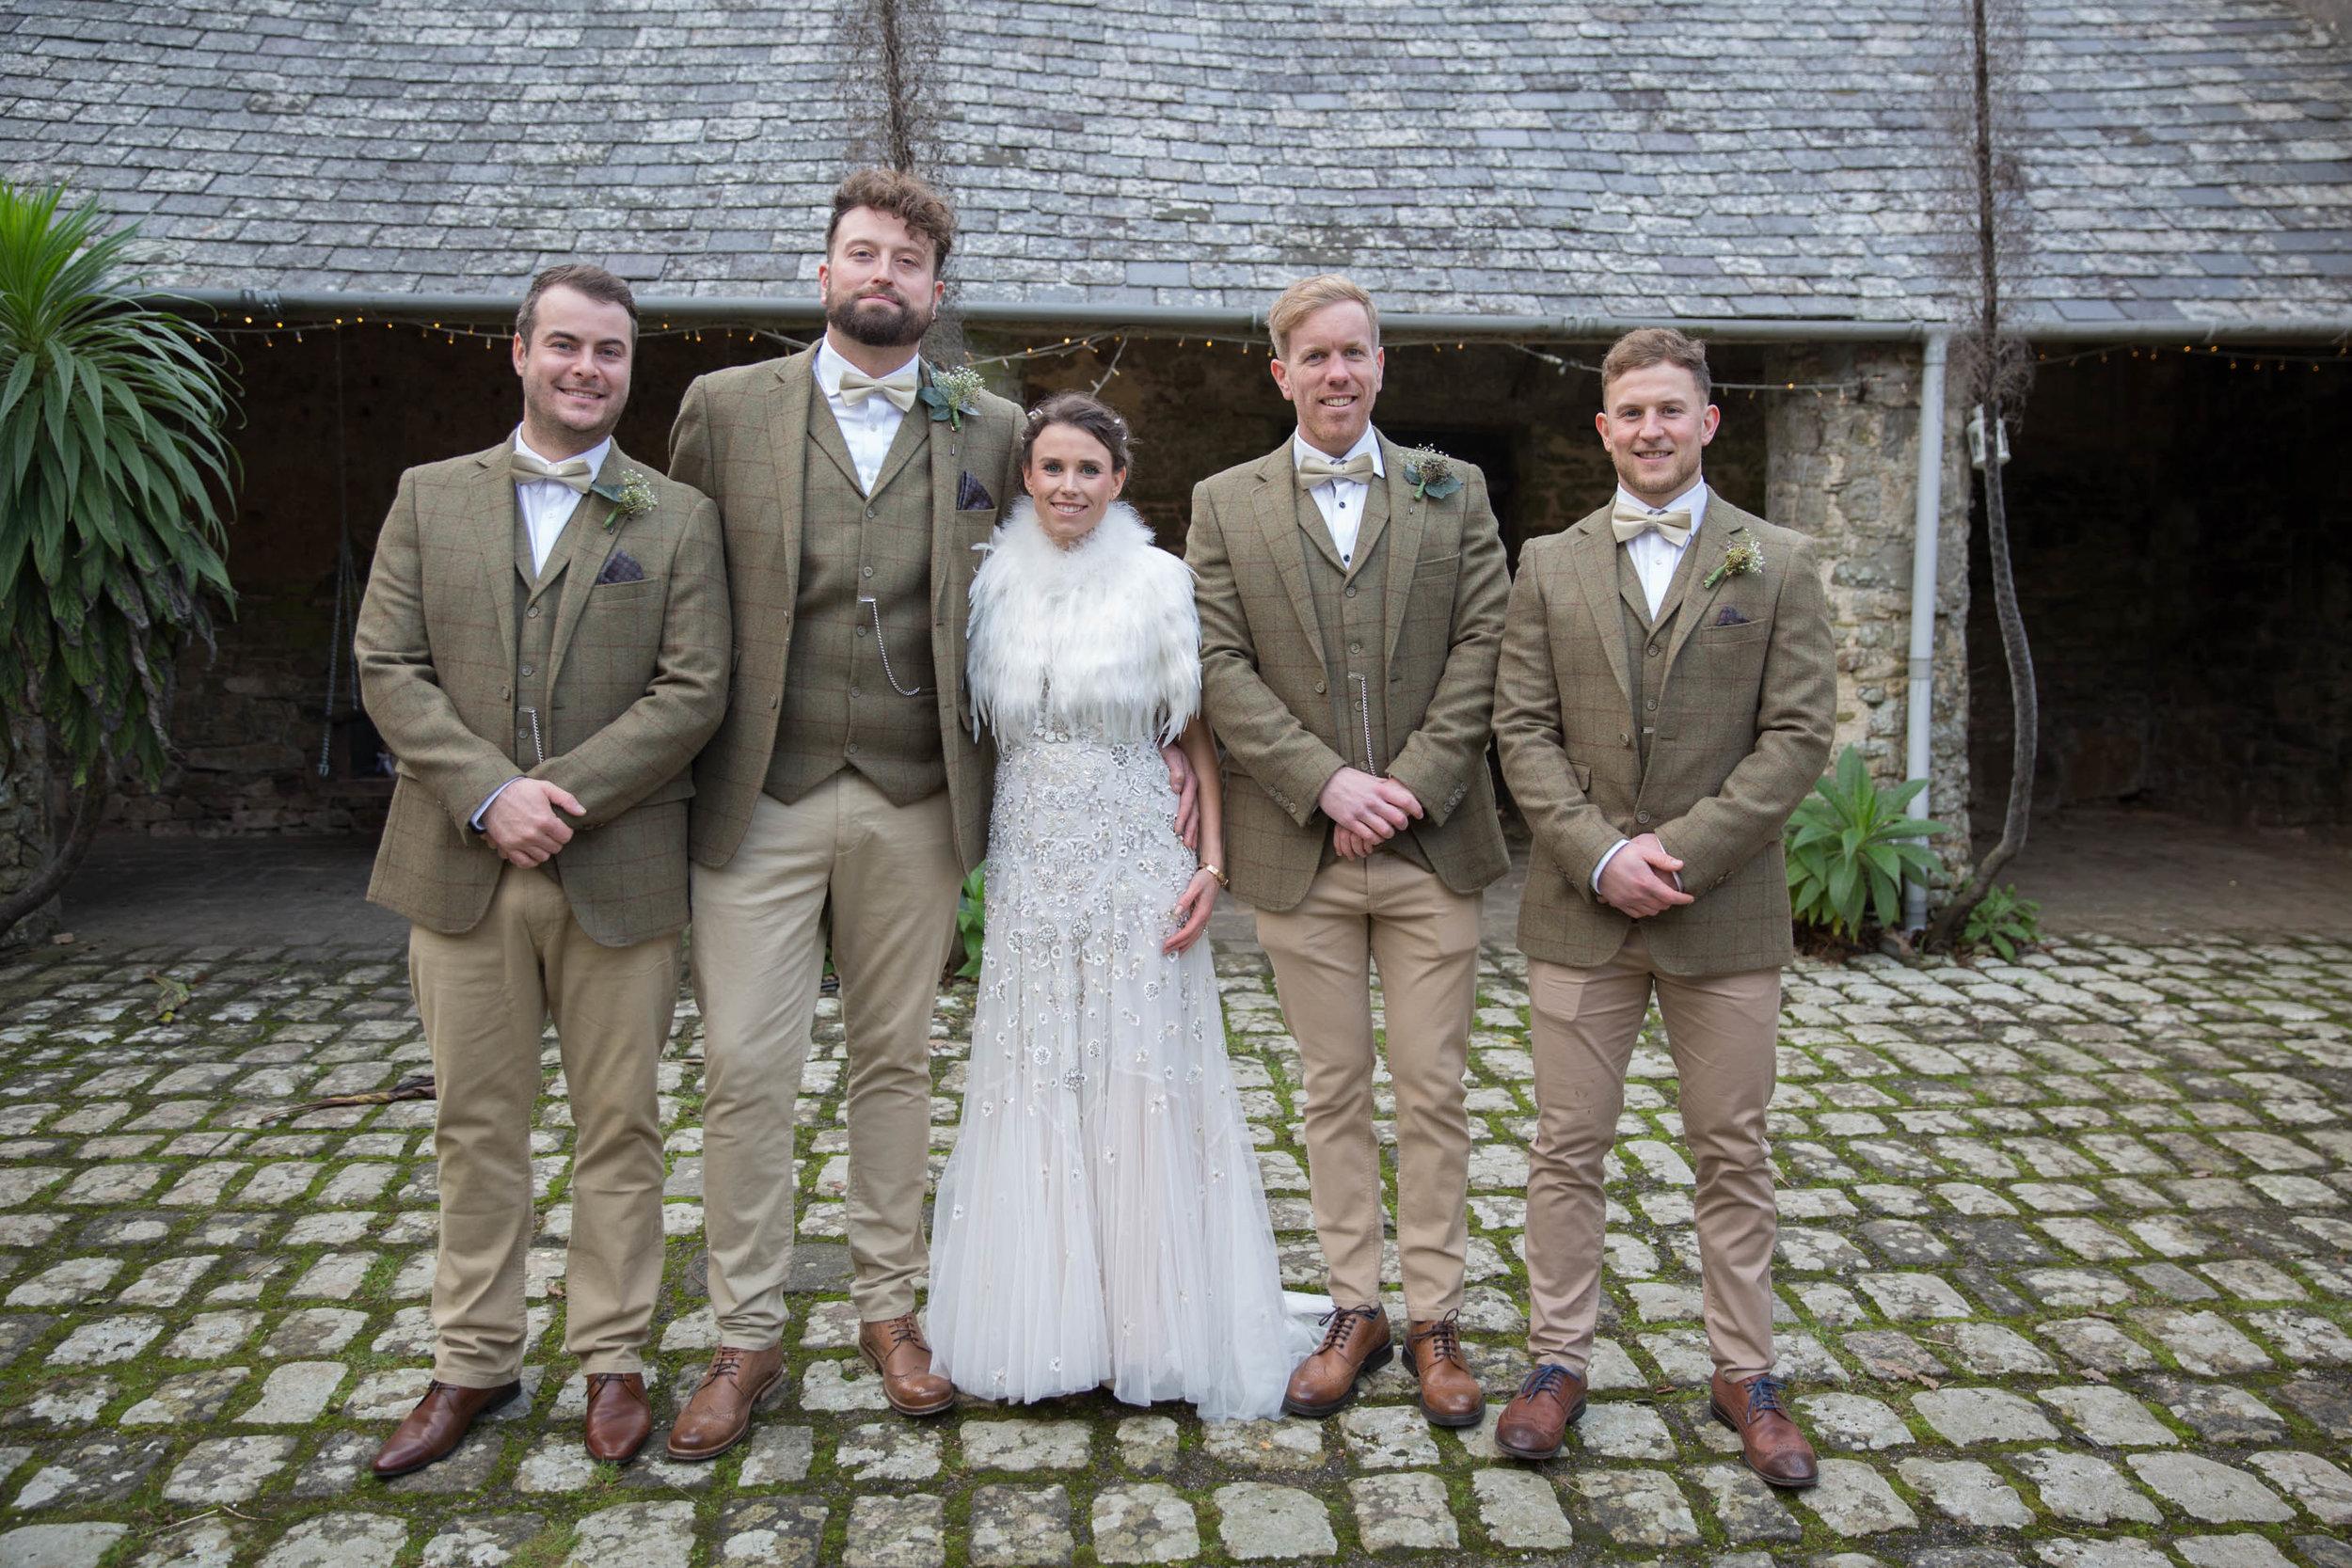 Jess & Ben - Bristol Wedding Photographer - Wright Wedding Photography - 100